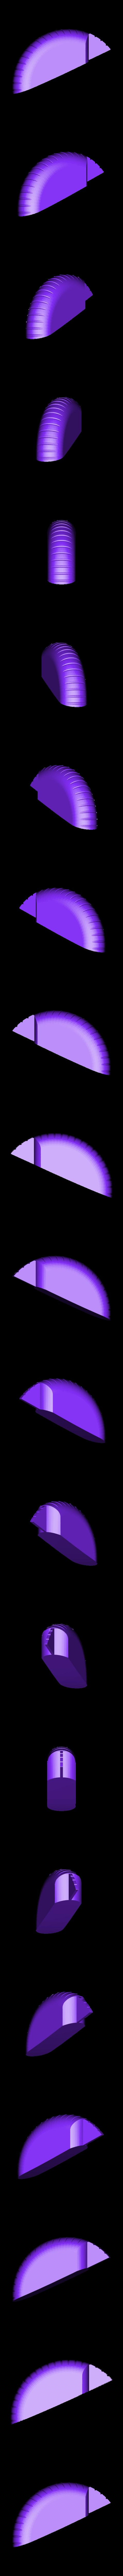 V3_mouse_wheel.STL Download free STL file Multi-Color Computer Mouse Model: Industrial/Product Design • 3D printable model, MosaicManufacturing